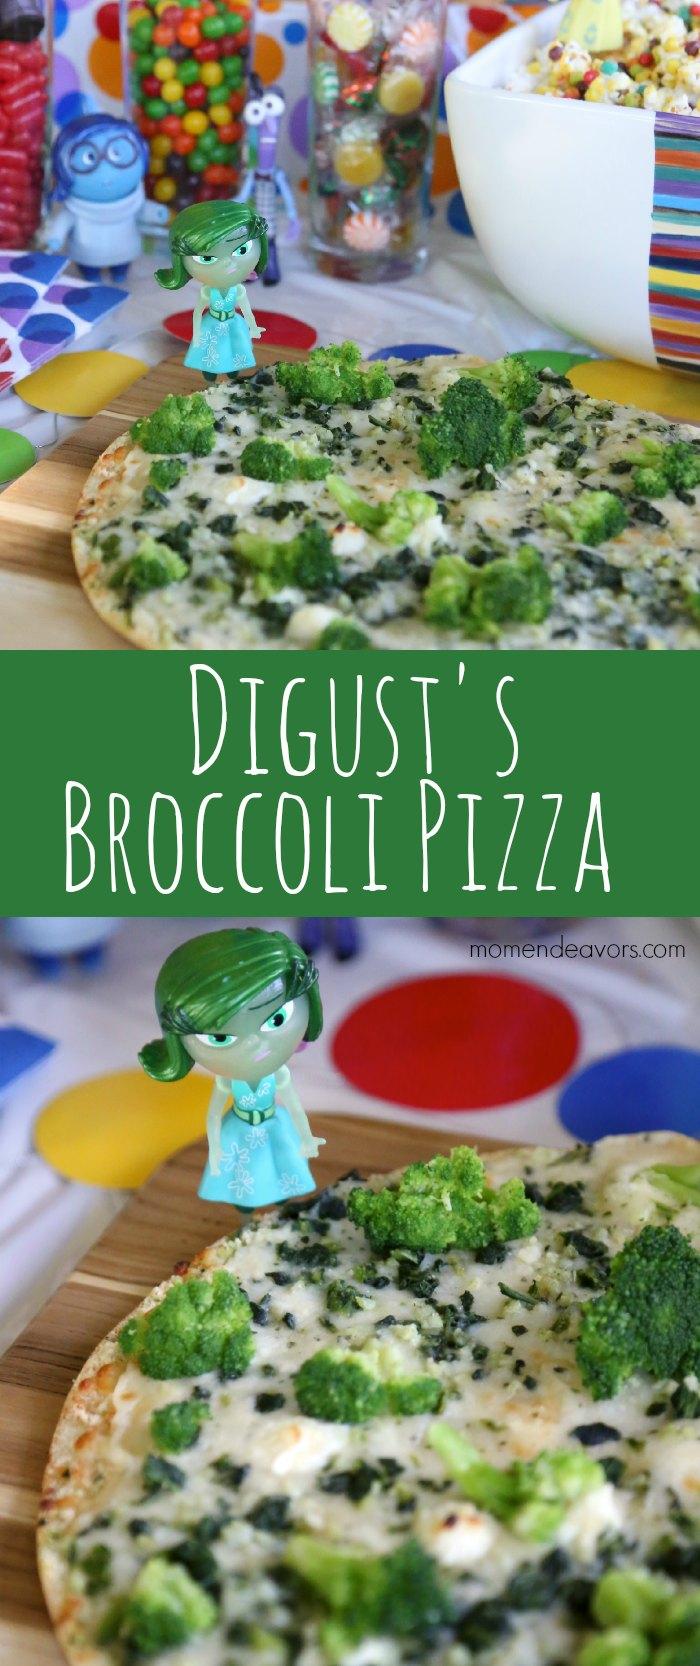 Disgust's Broccoli Pizza